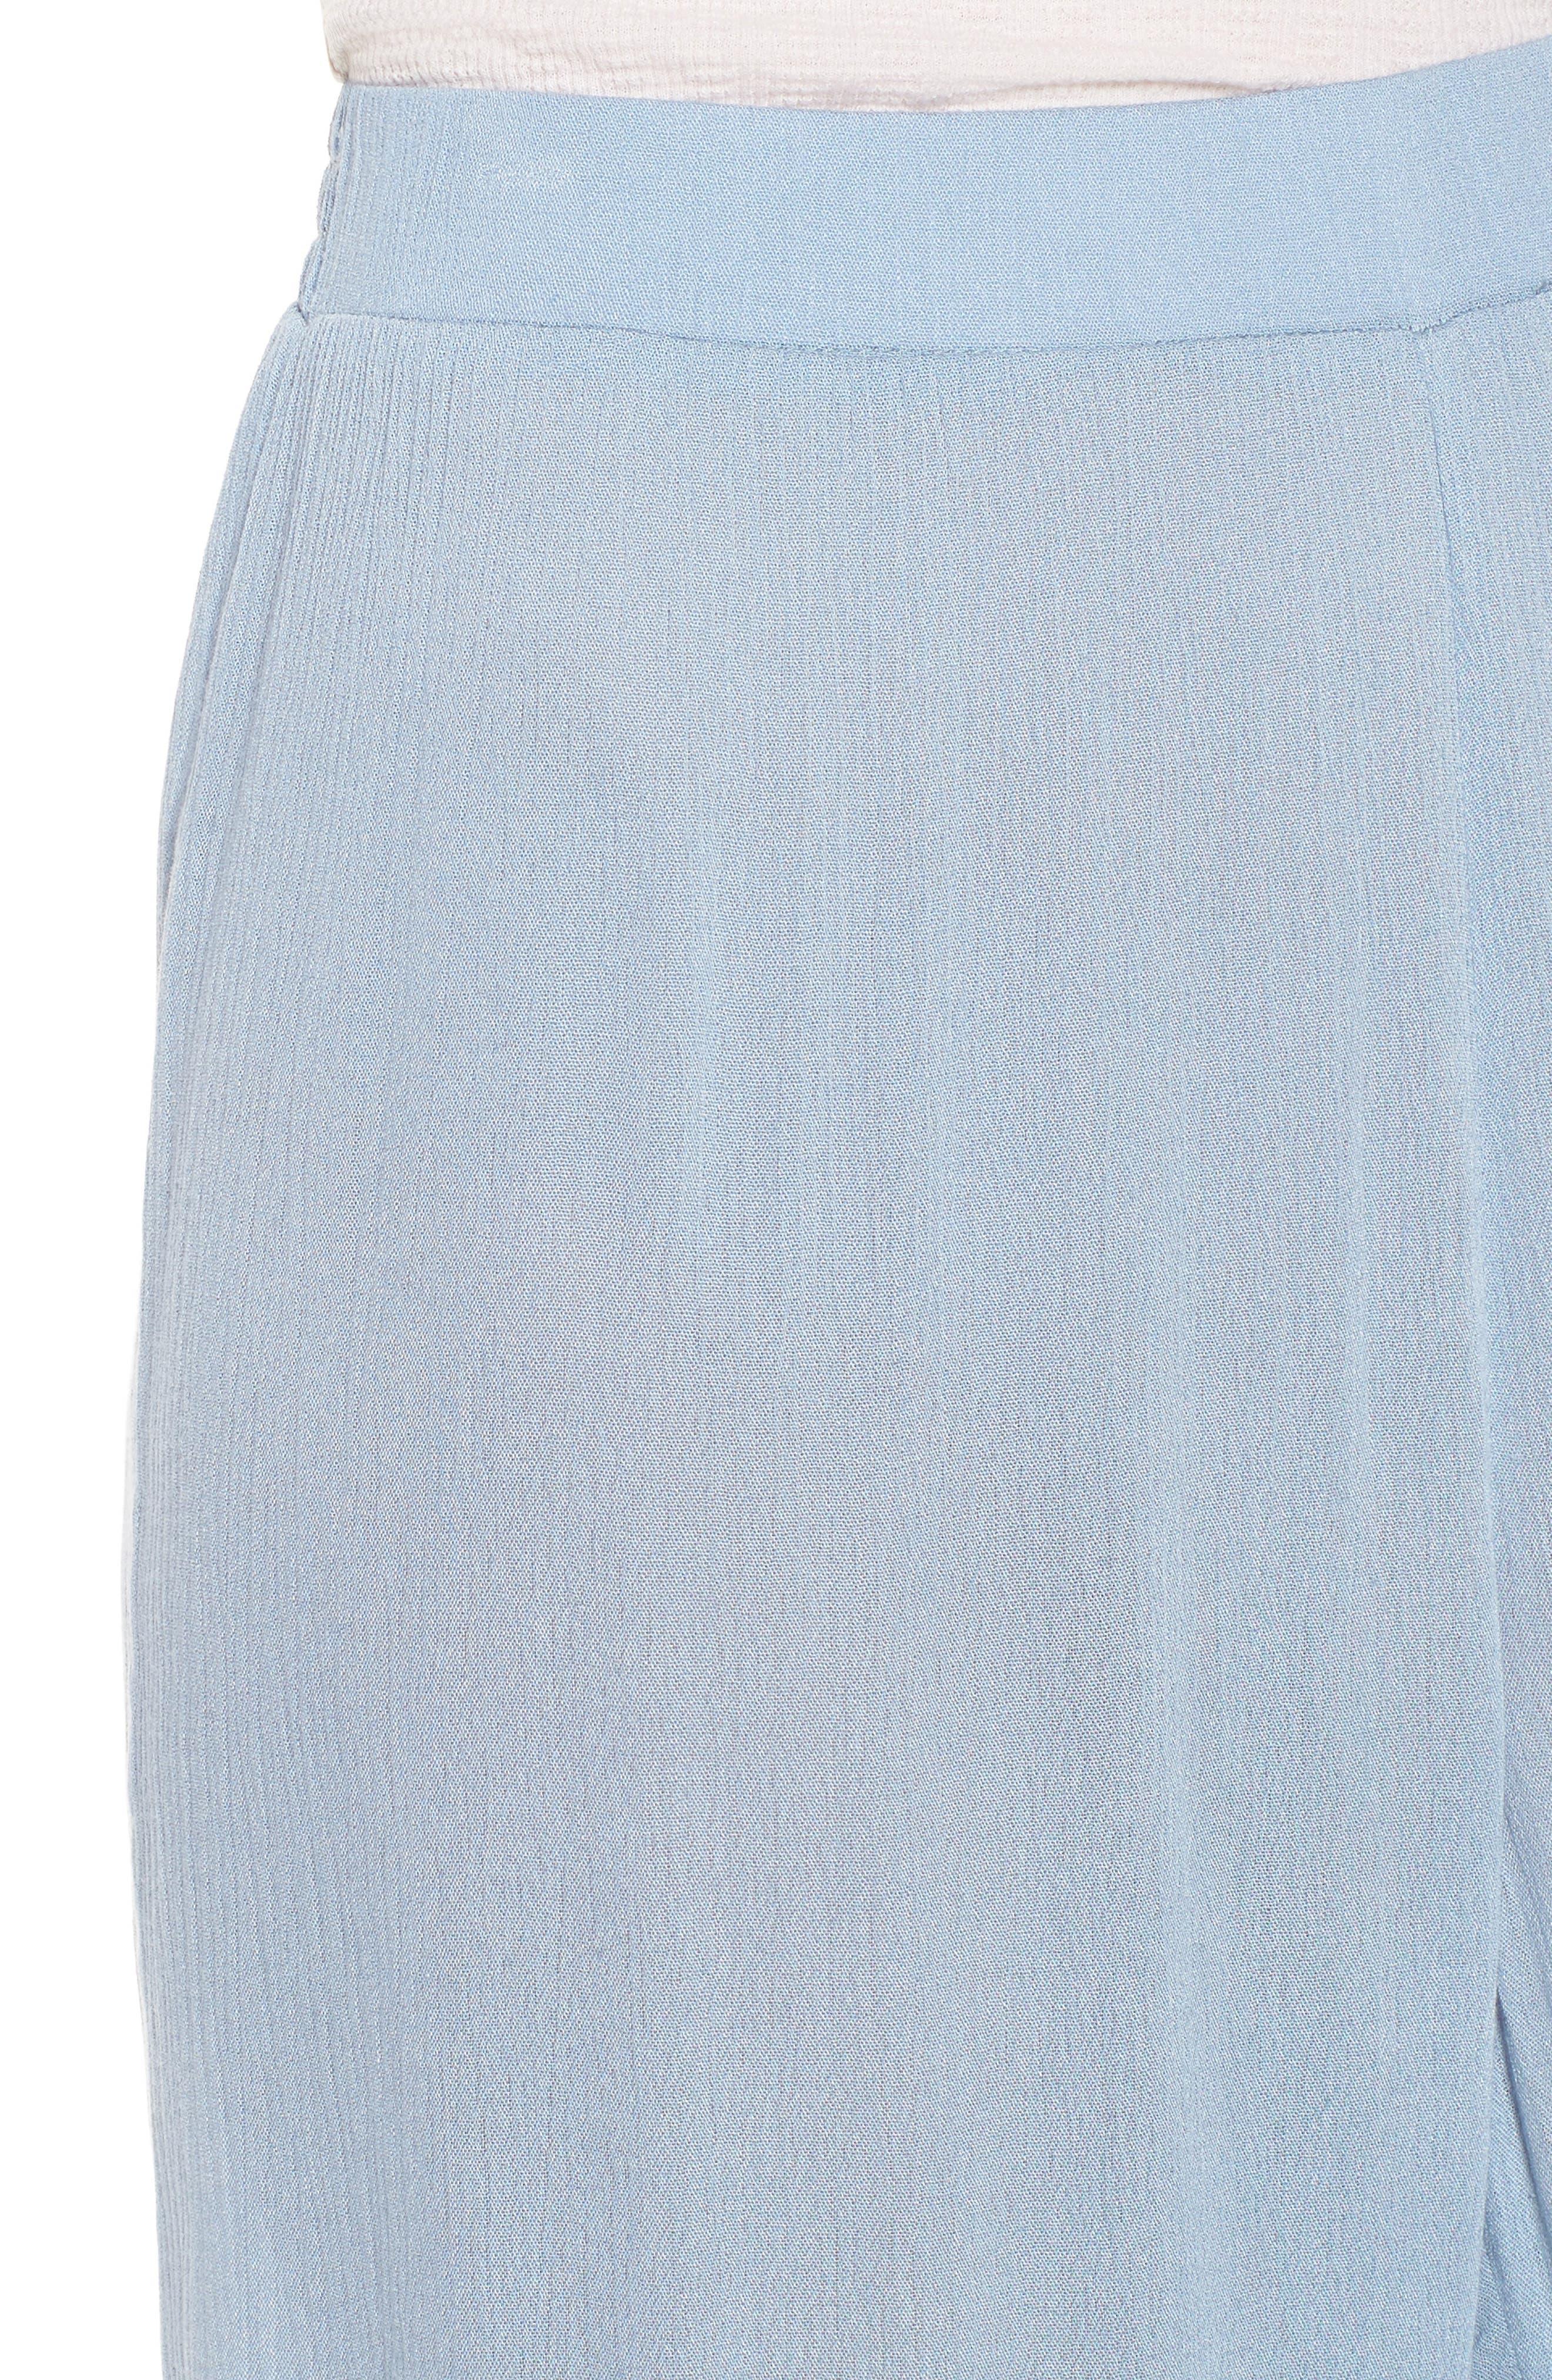 Mystique Ruffle Hem Beach Pants,                             Alternate thumbnail 4, color,                             400